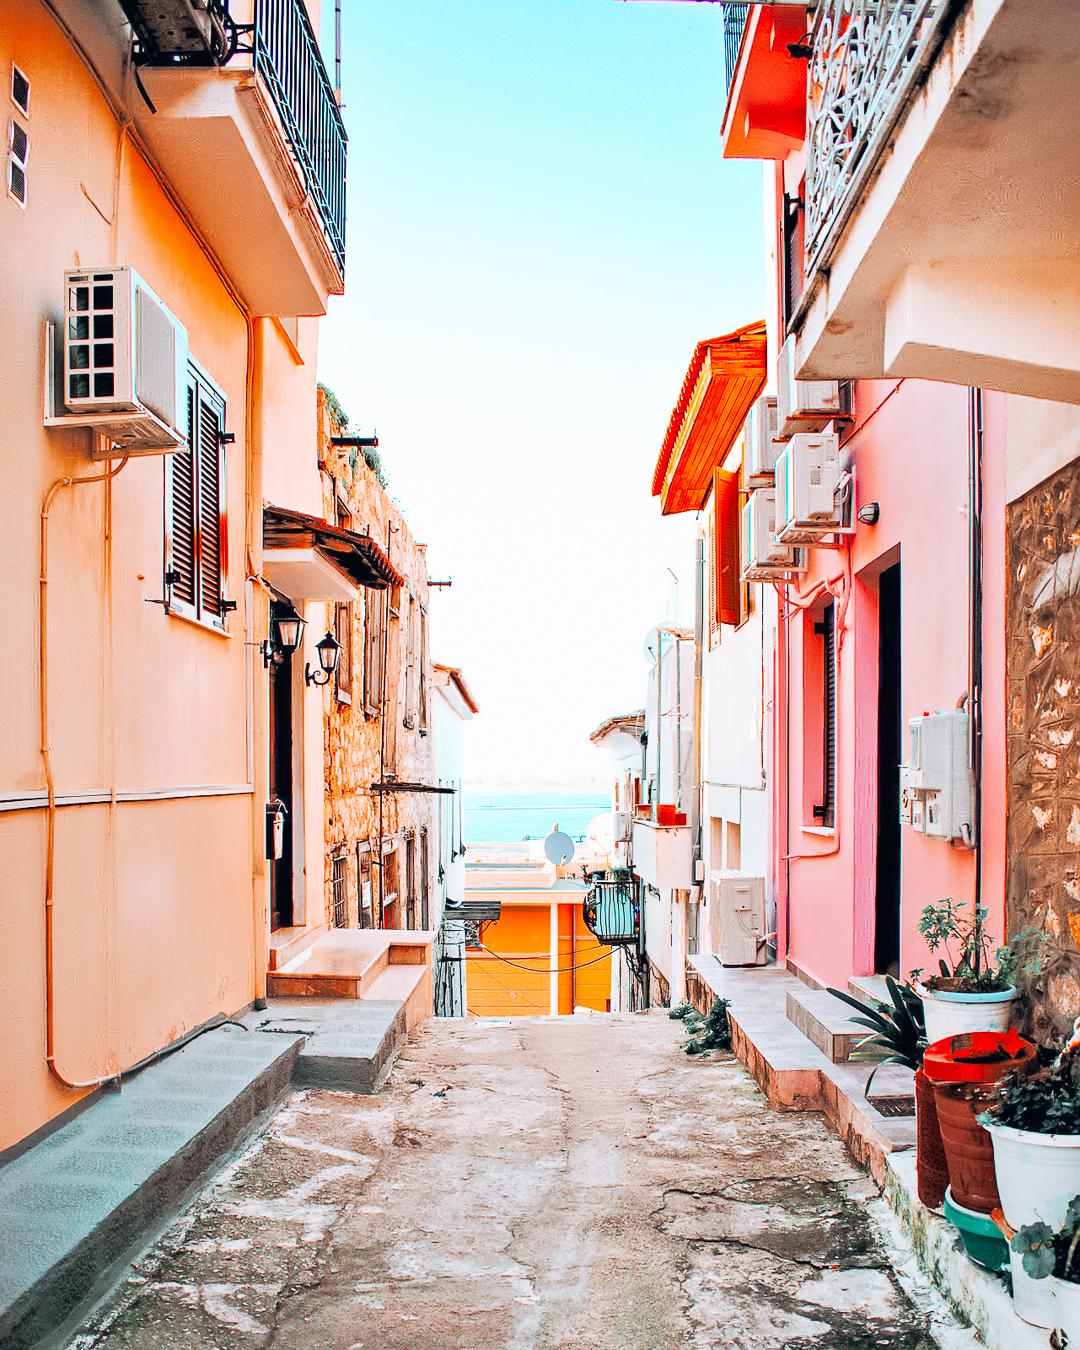 Street in Nafplio, Greece